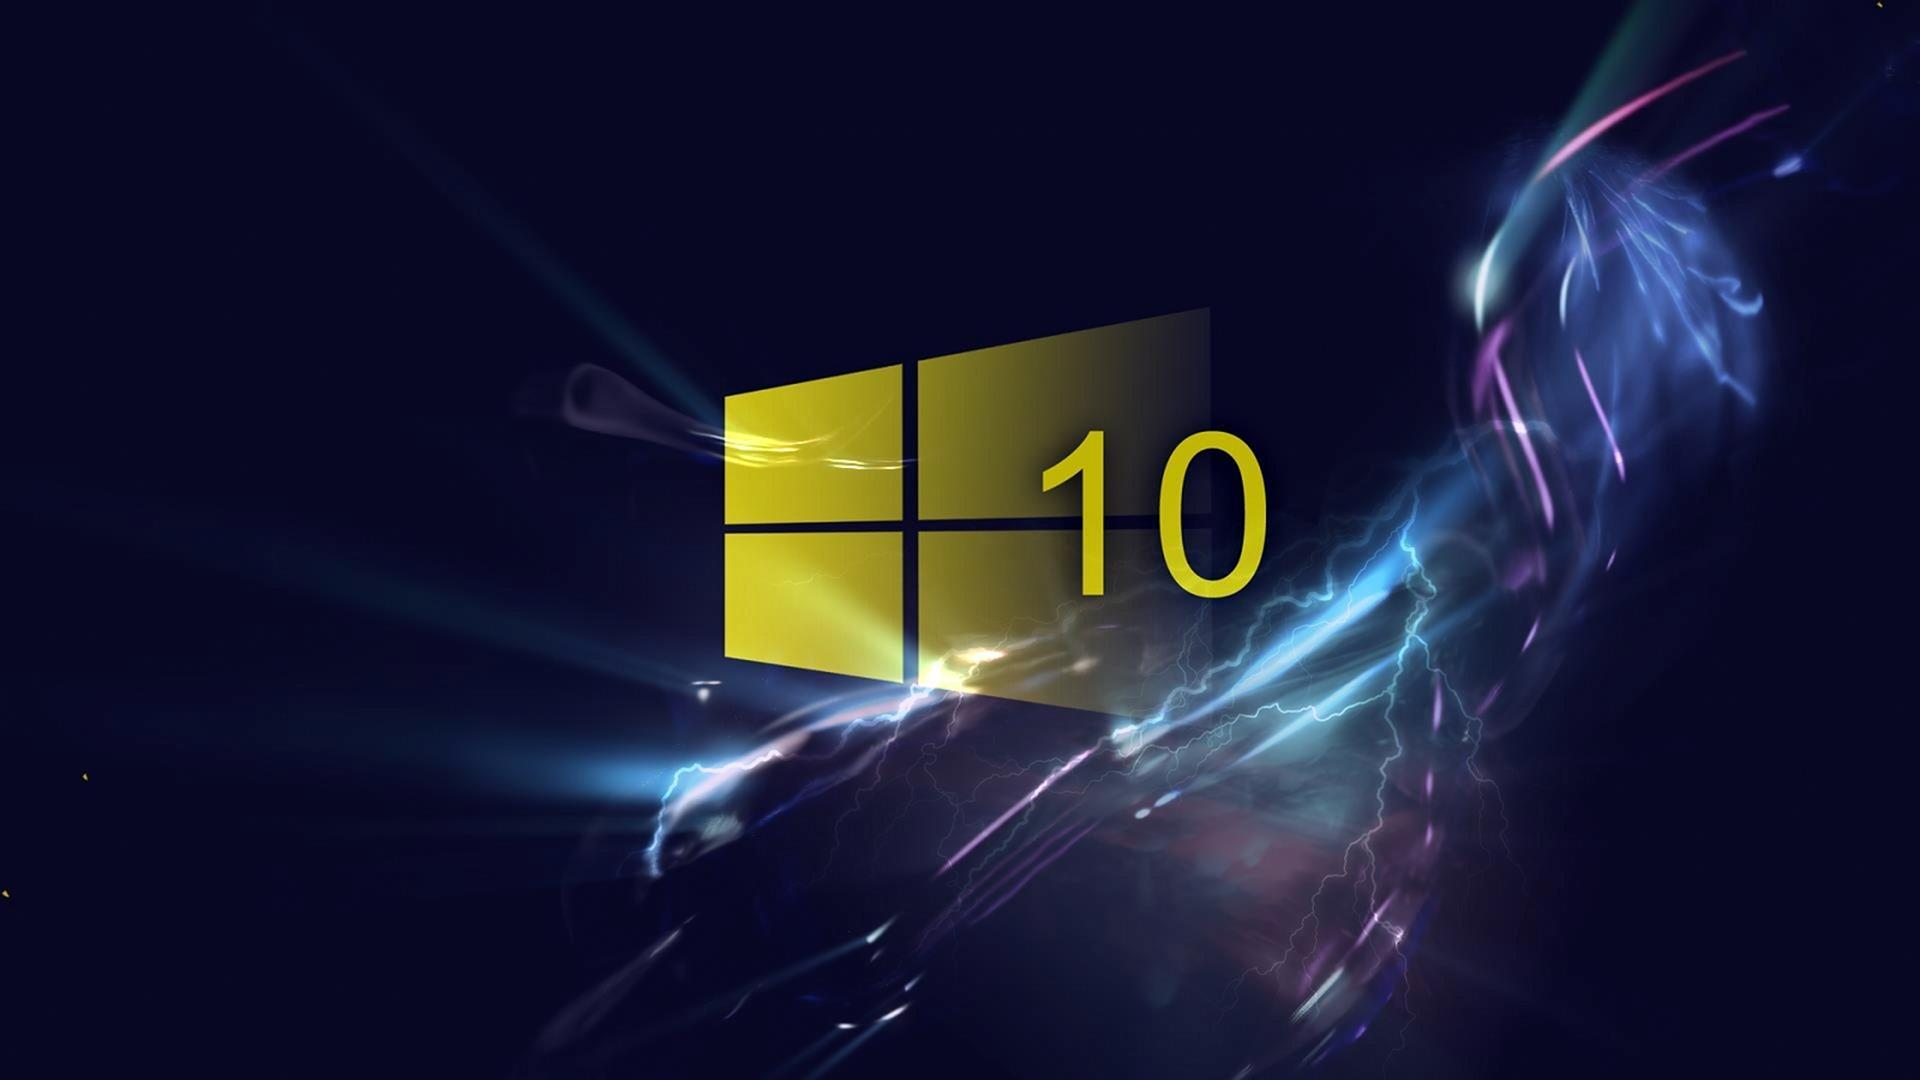 Windows 10 Papel De Parede HD